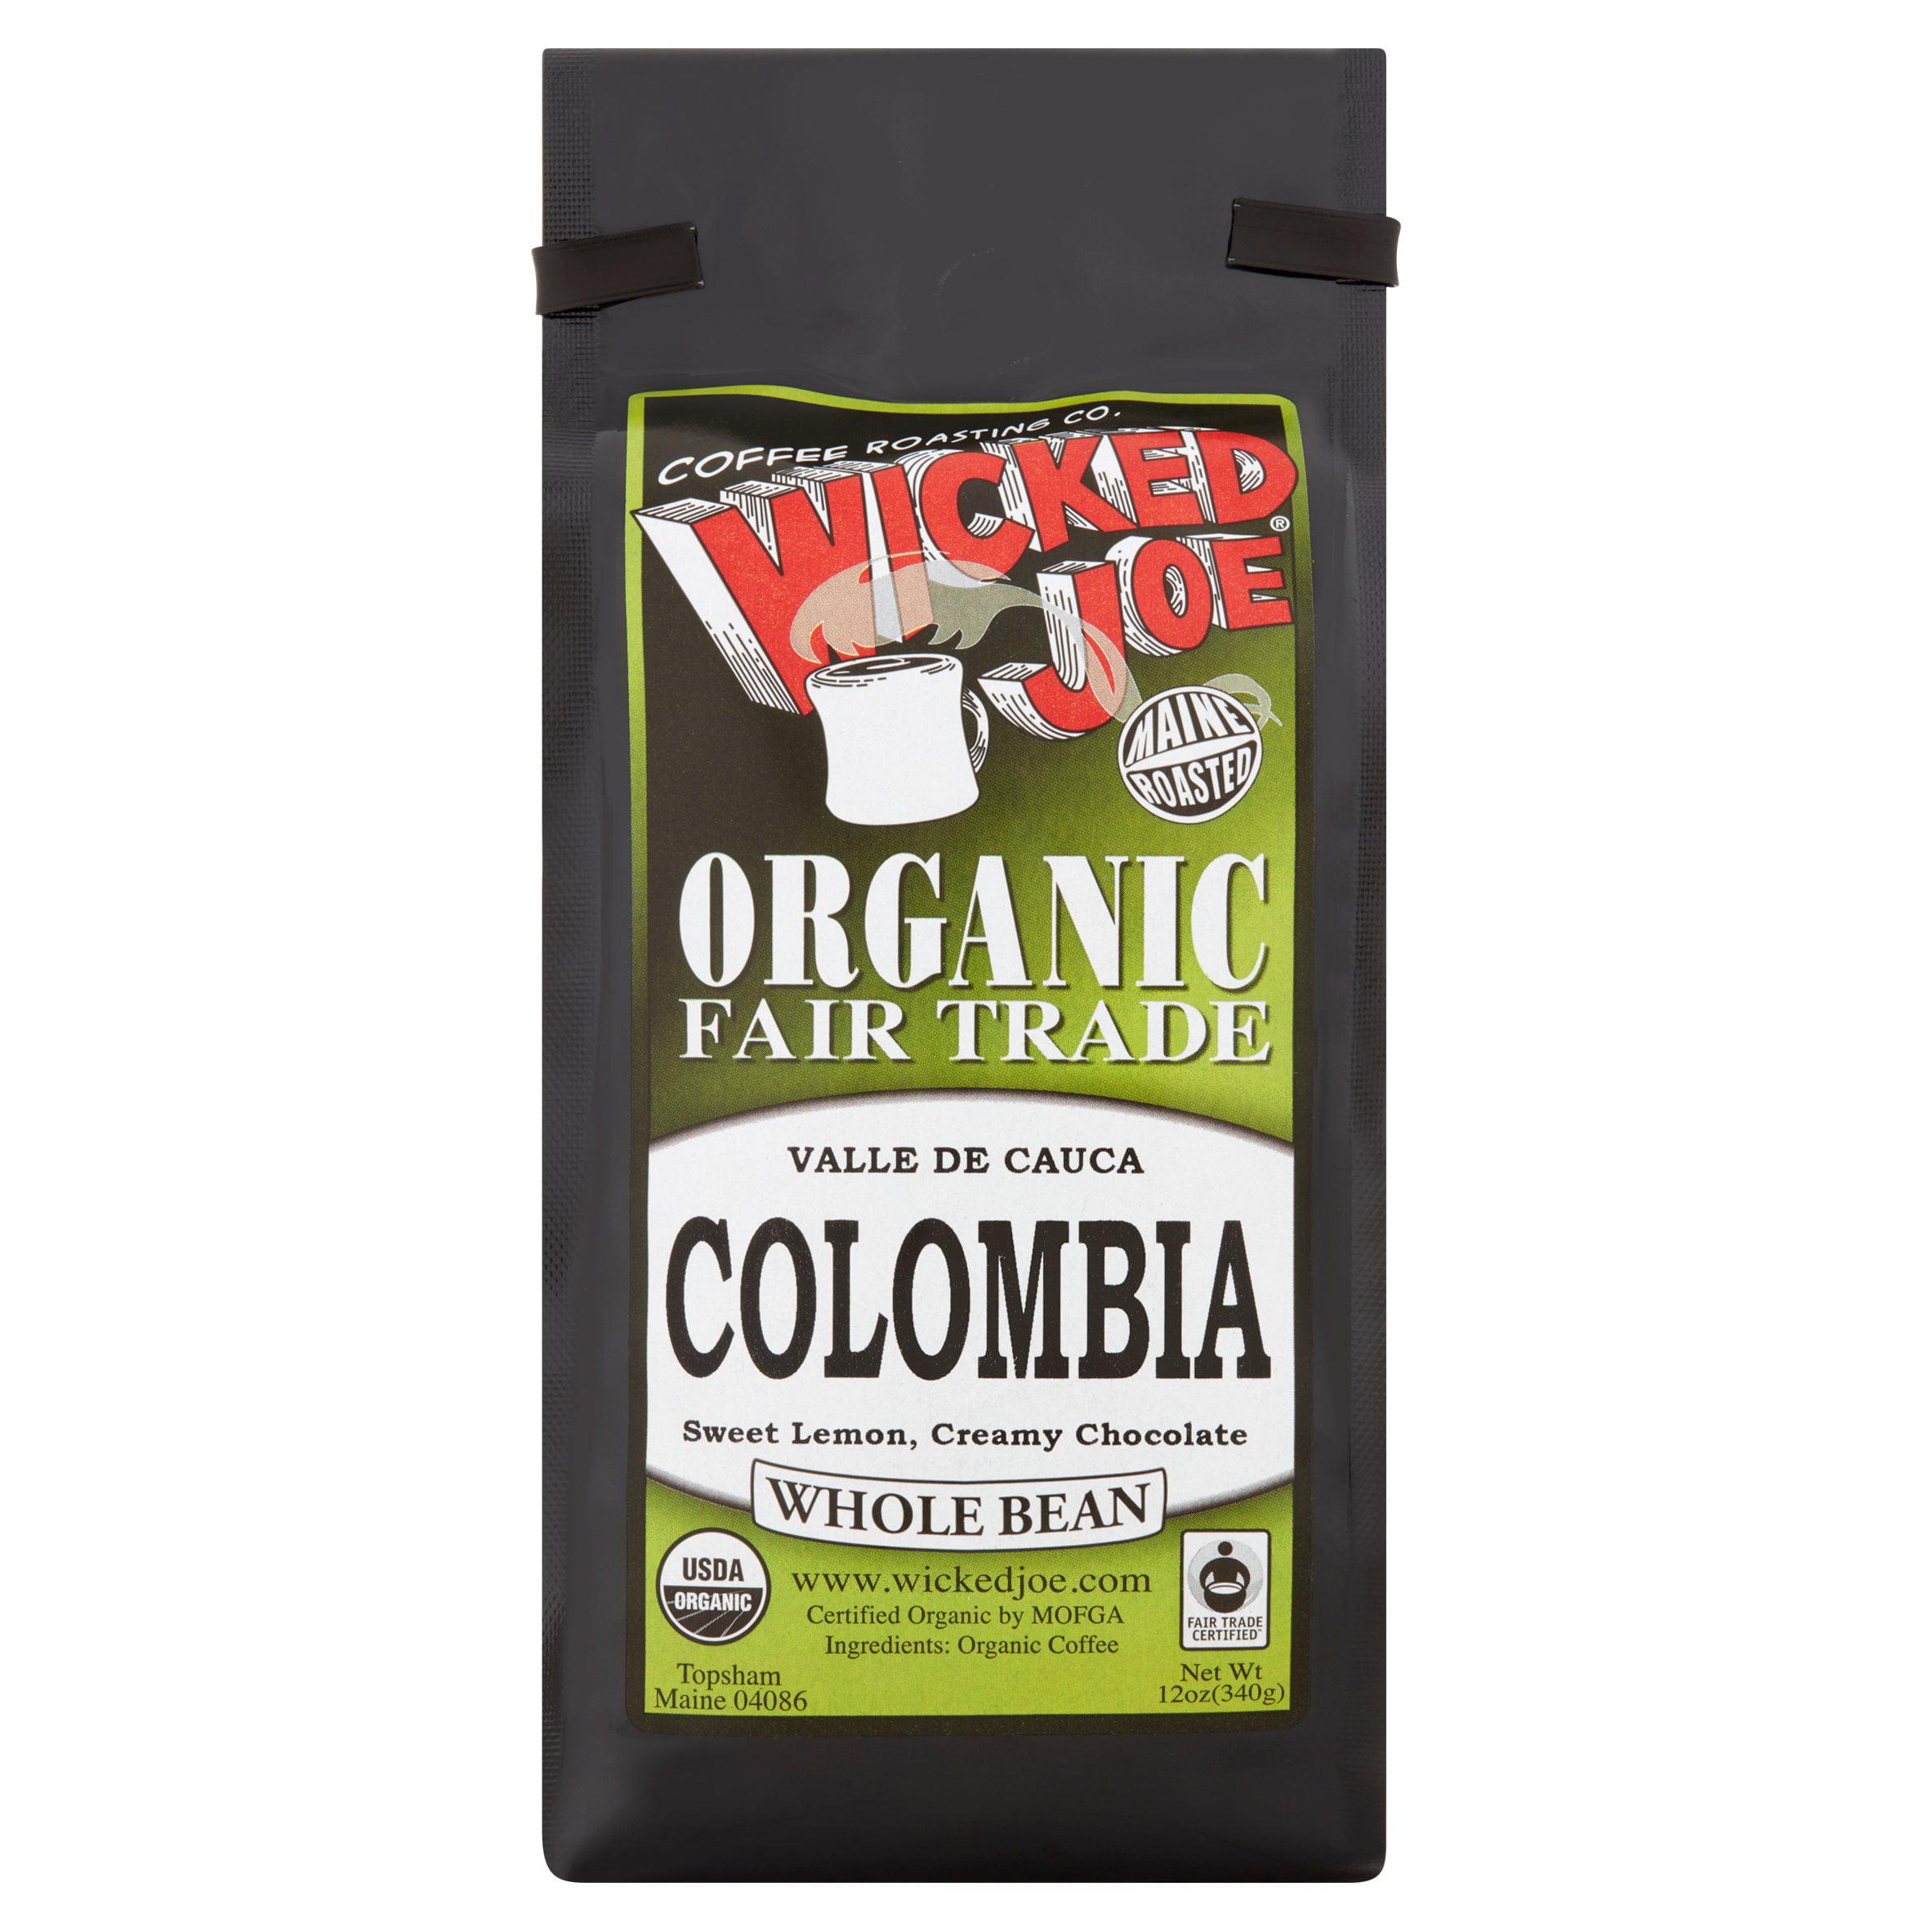 Wicked Joe Coffee, Coffee Bean Organic Medium Roast, 12 Oz (Pack Of 6)